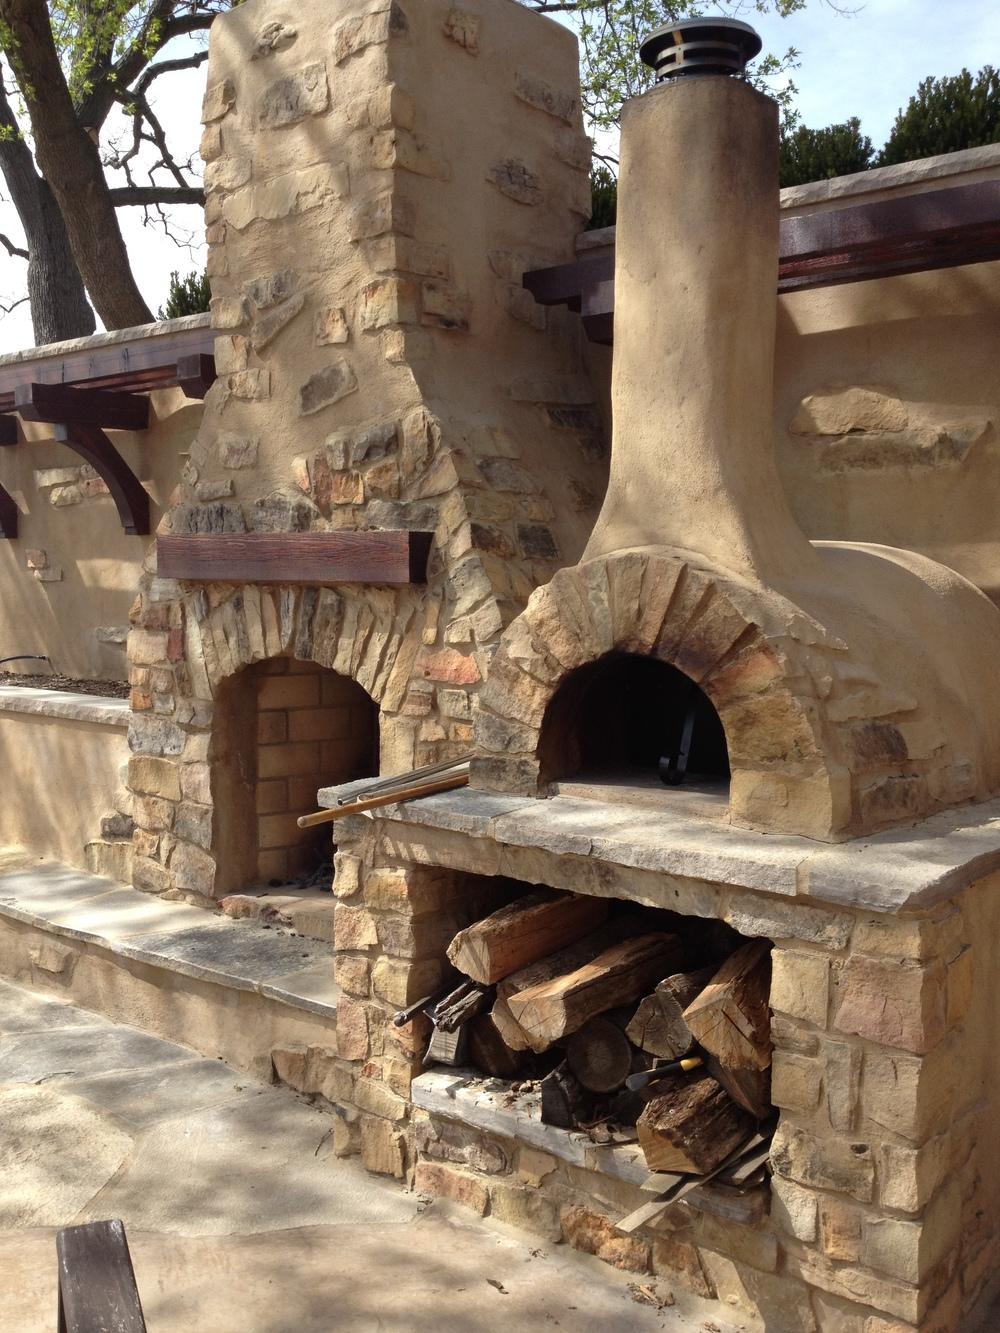 outdoor kitchens u0026 pizza ovens u2014 spurlocks natural stone and brick